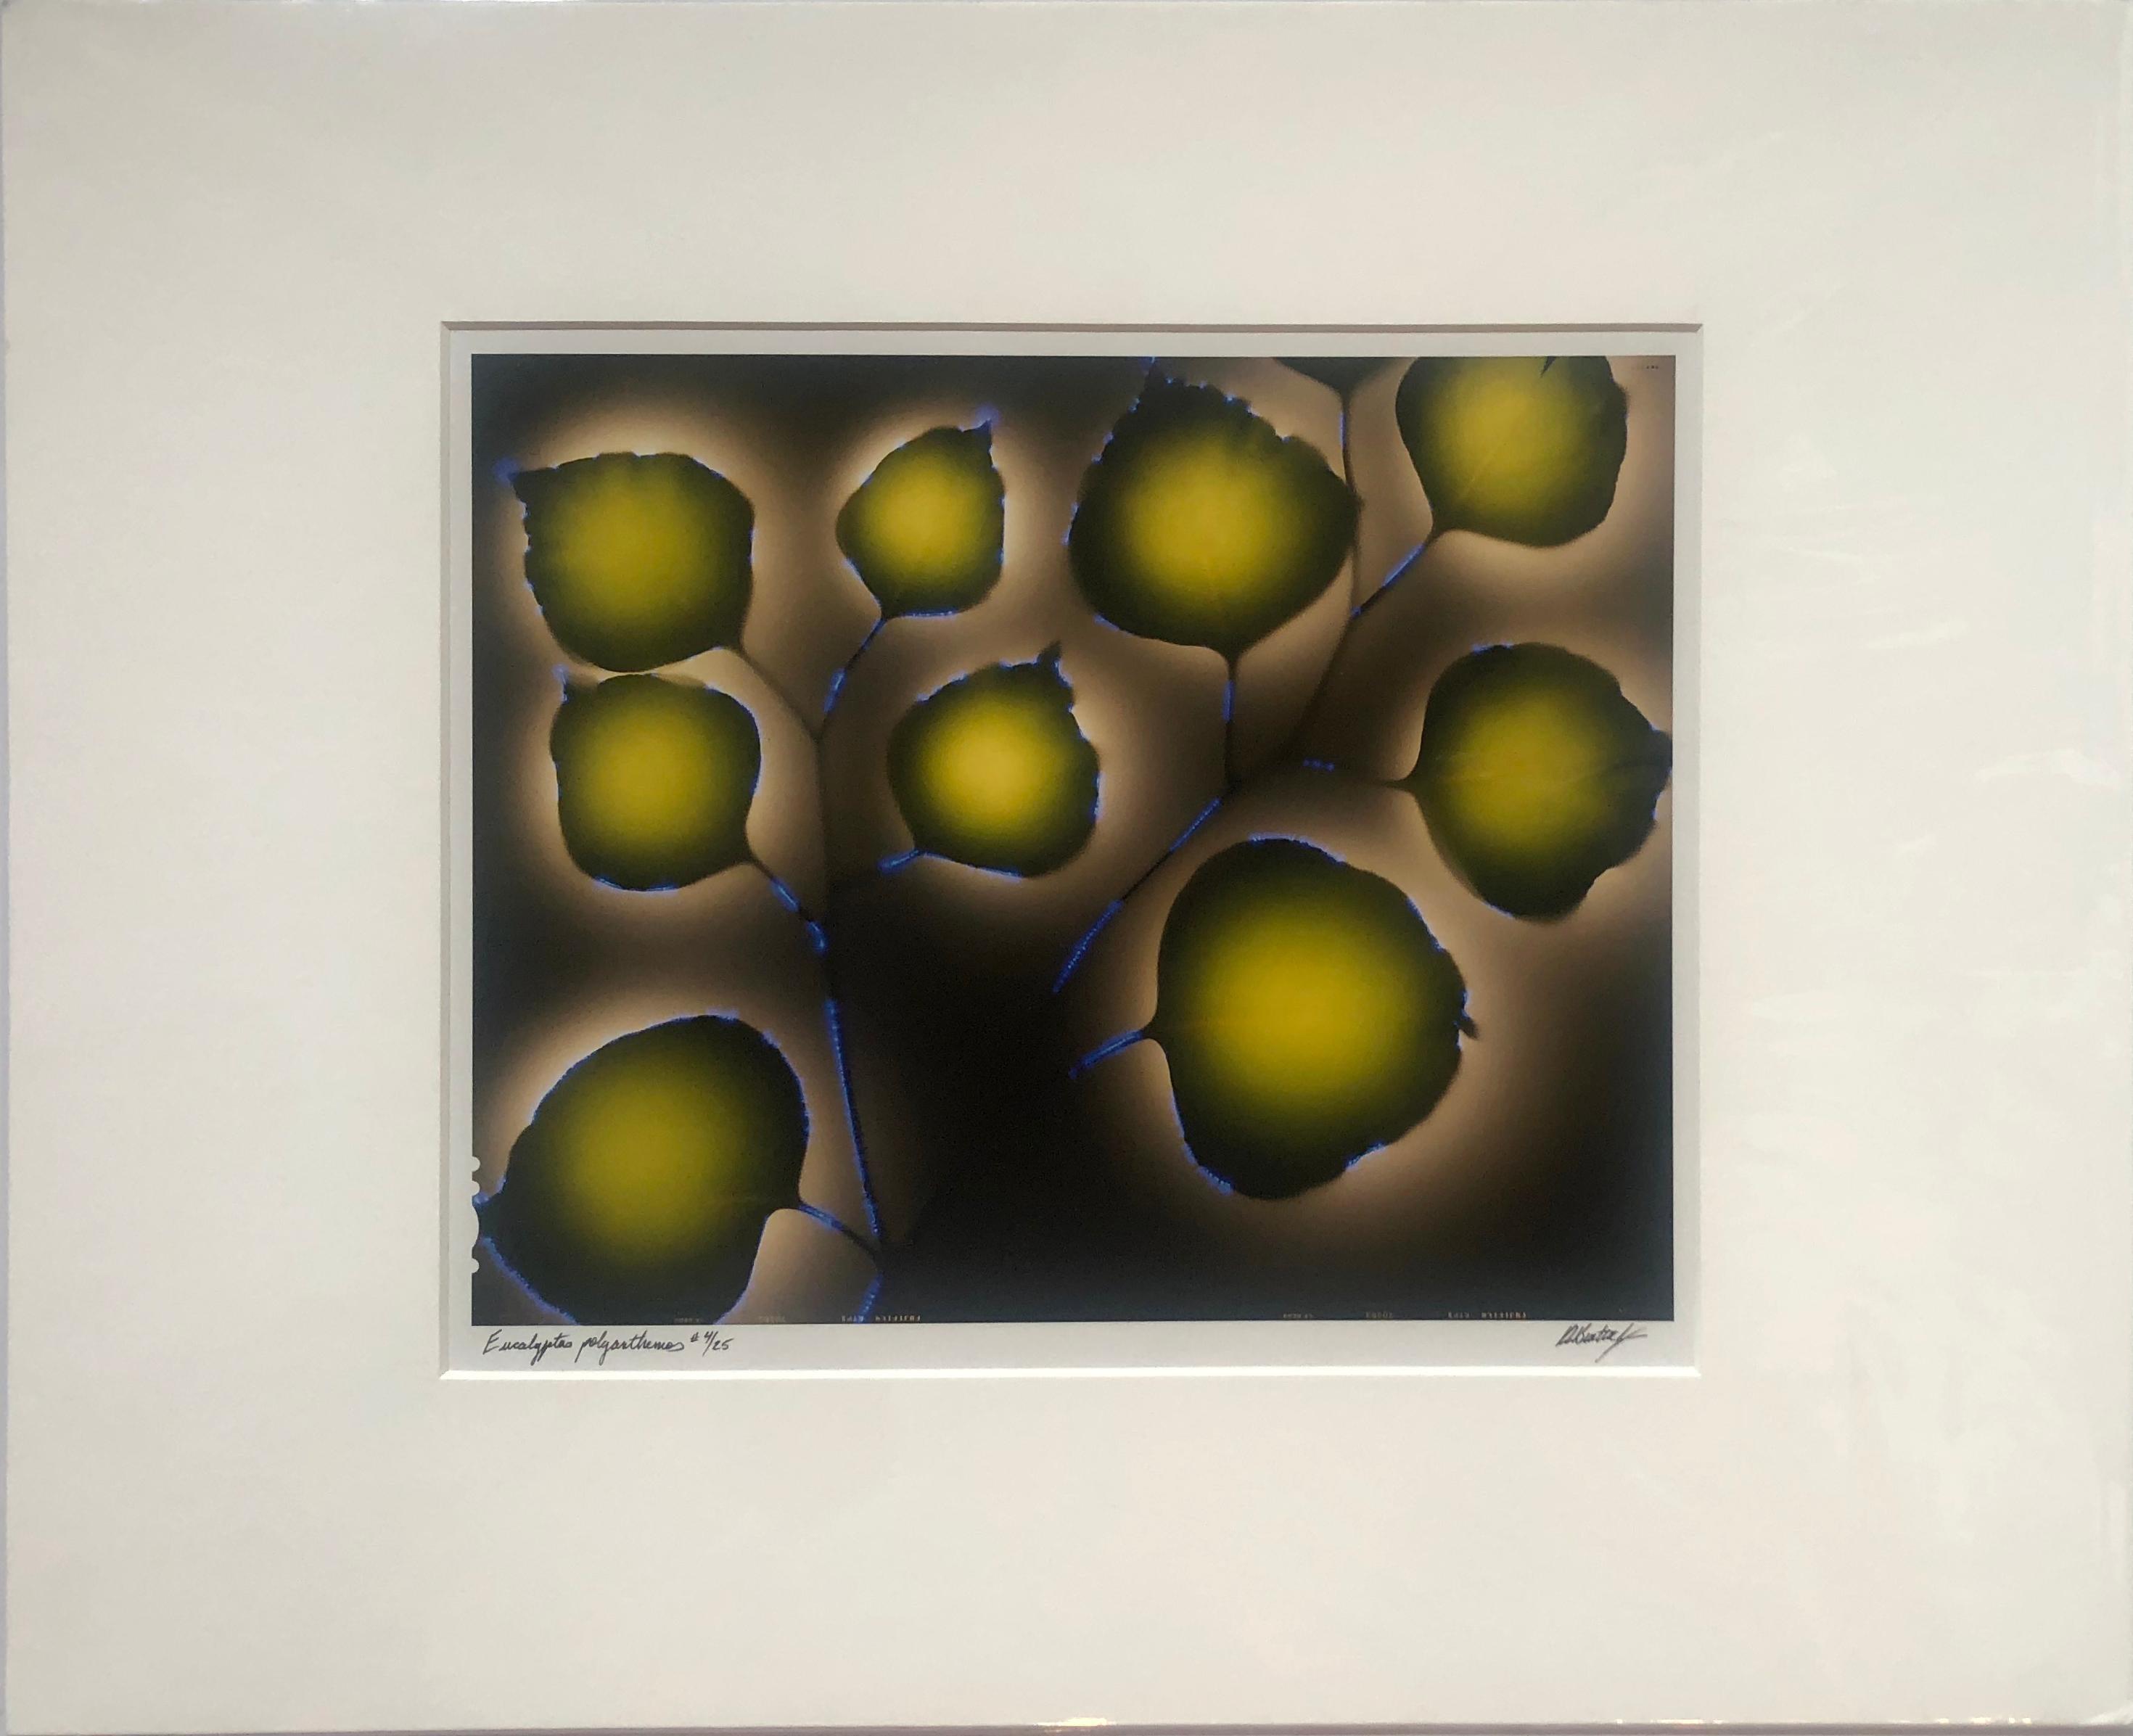 """Eucalyptus polyanthemos"" by Robert Buelteman, Cameraless photograph print, 2000"